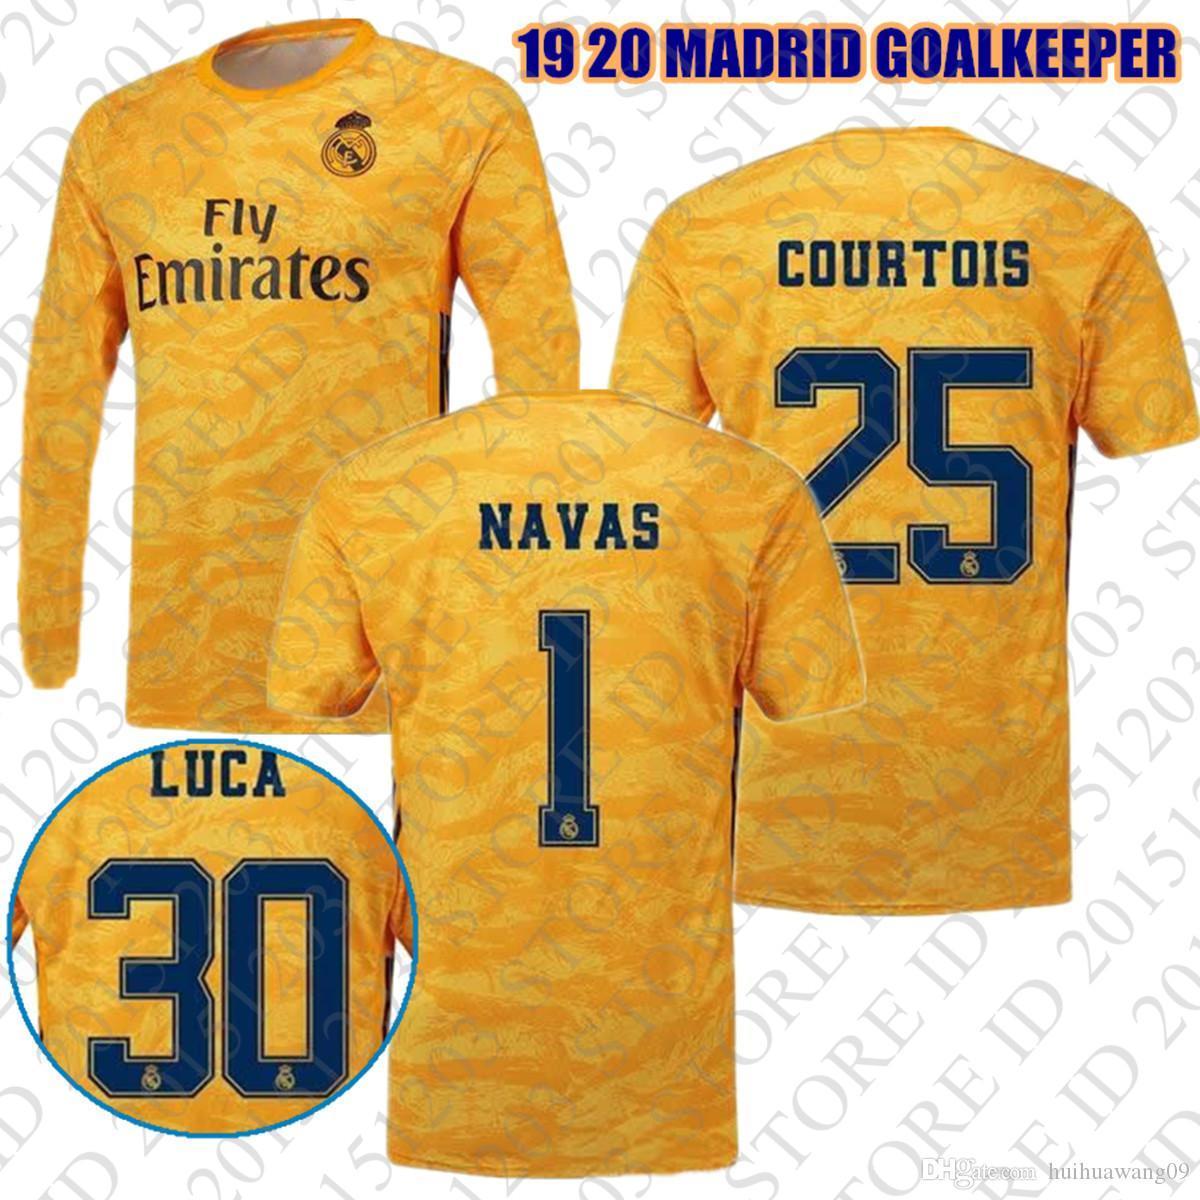 ab4f919f98 Camiseta De Mangas Largas 2019 2020 # 25 Courtois Goalkeeper Real Madrid  Yellow 1 Navas Camisetas De Fútbol Camiseta Keeper Jersey Camisetas De  Fútbol Por ...